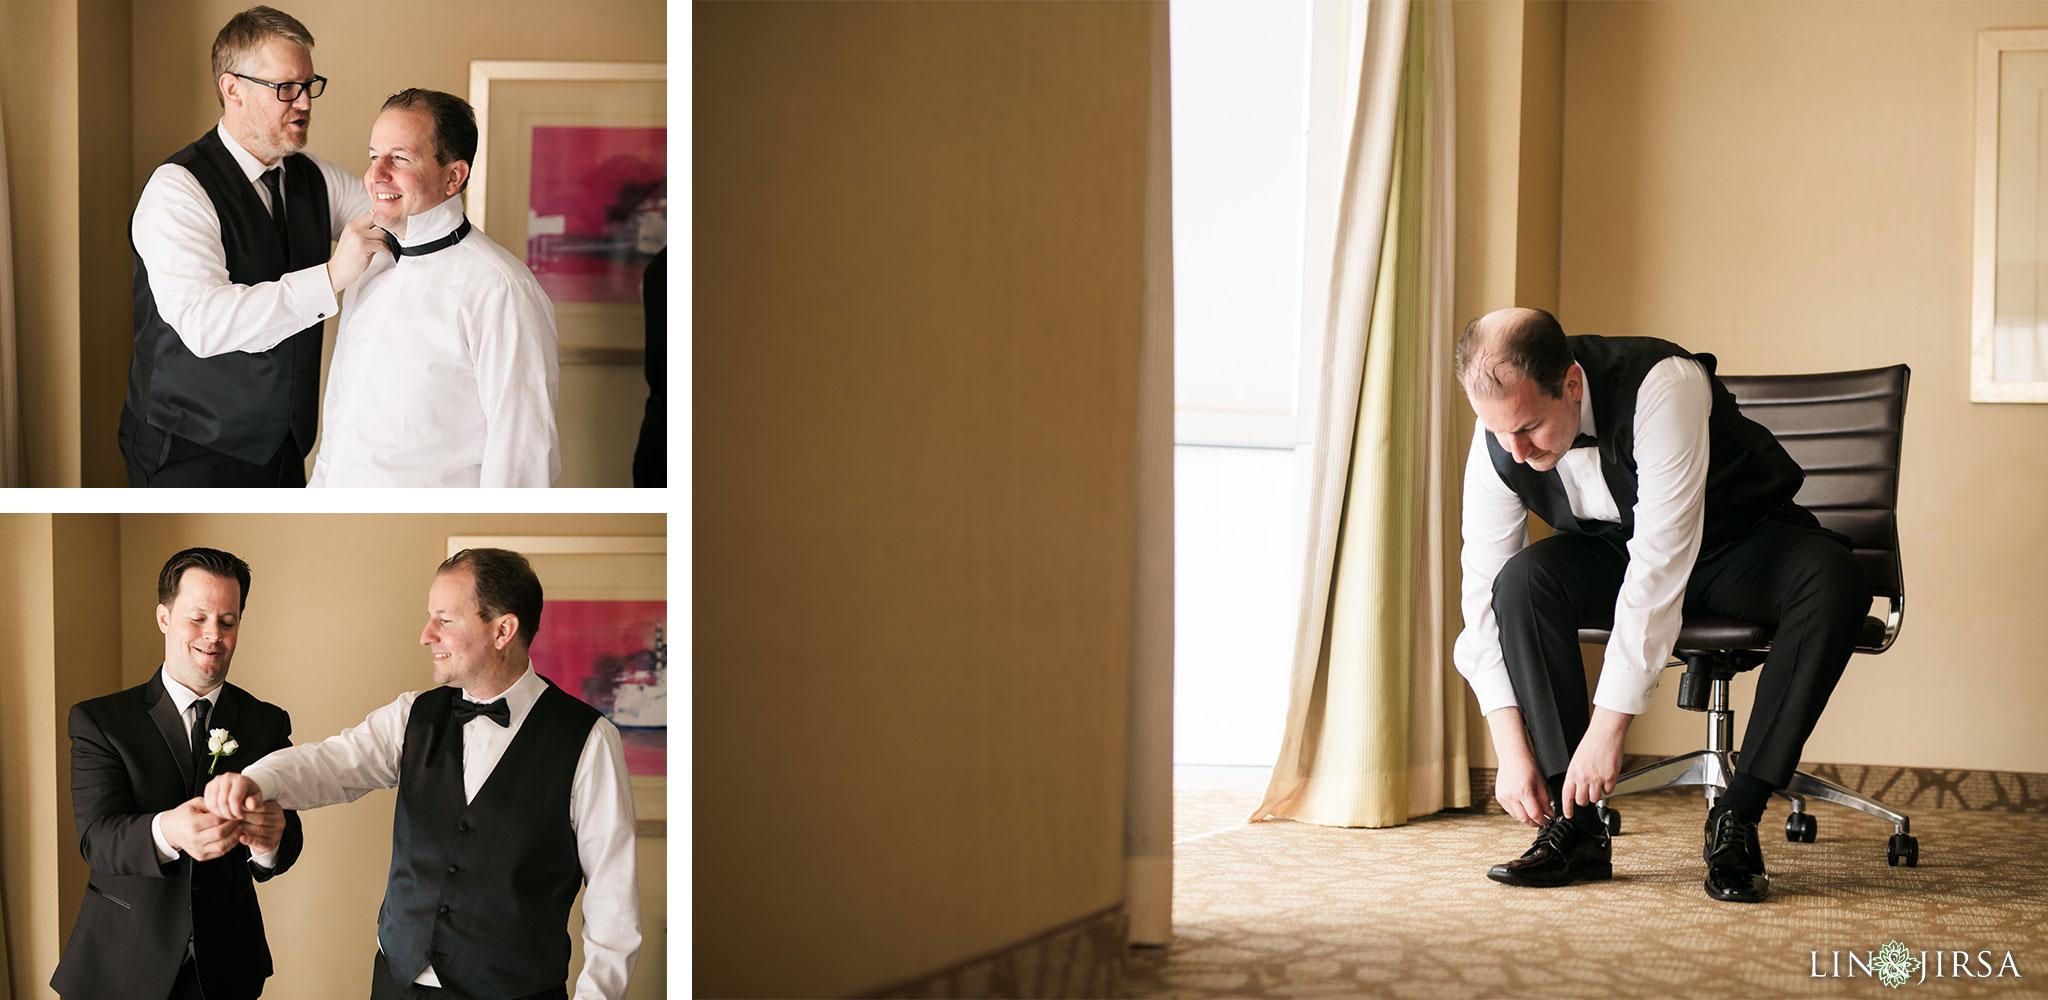 08 vertigo banquet hall glendale wedding photography